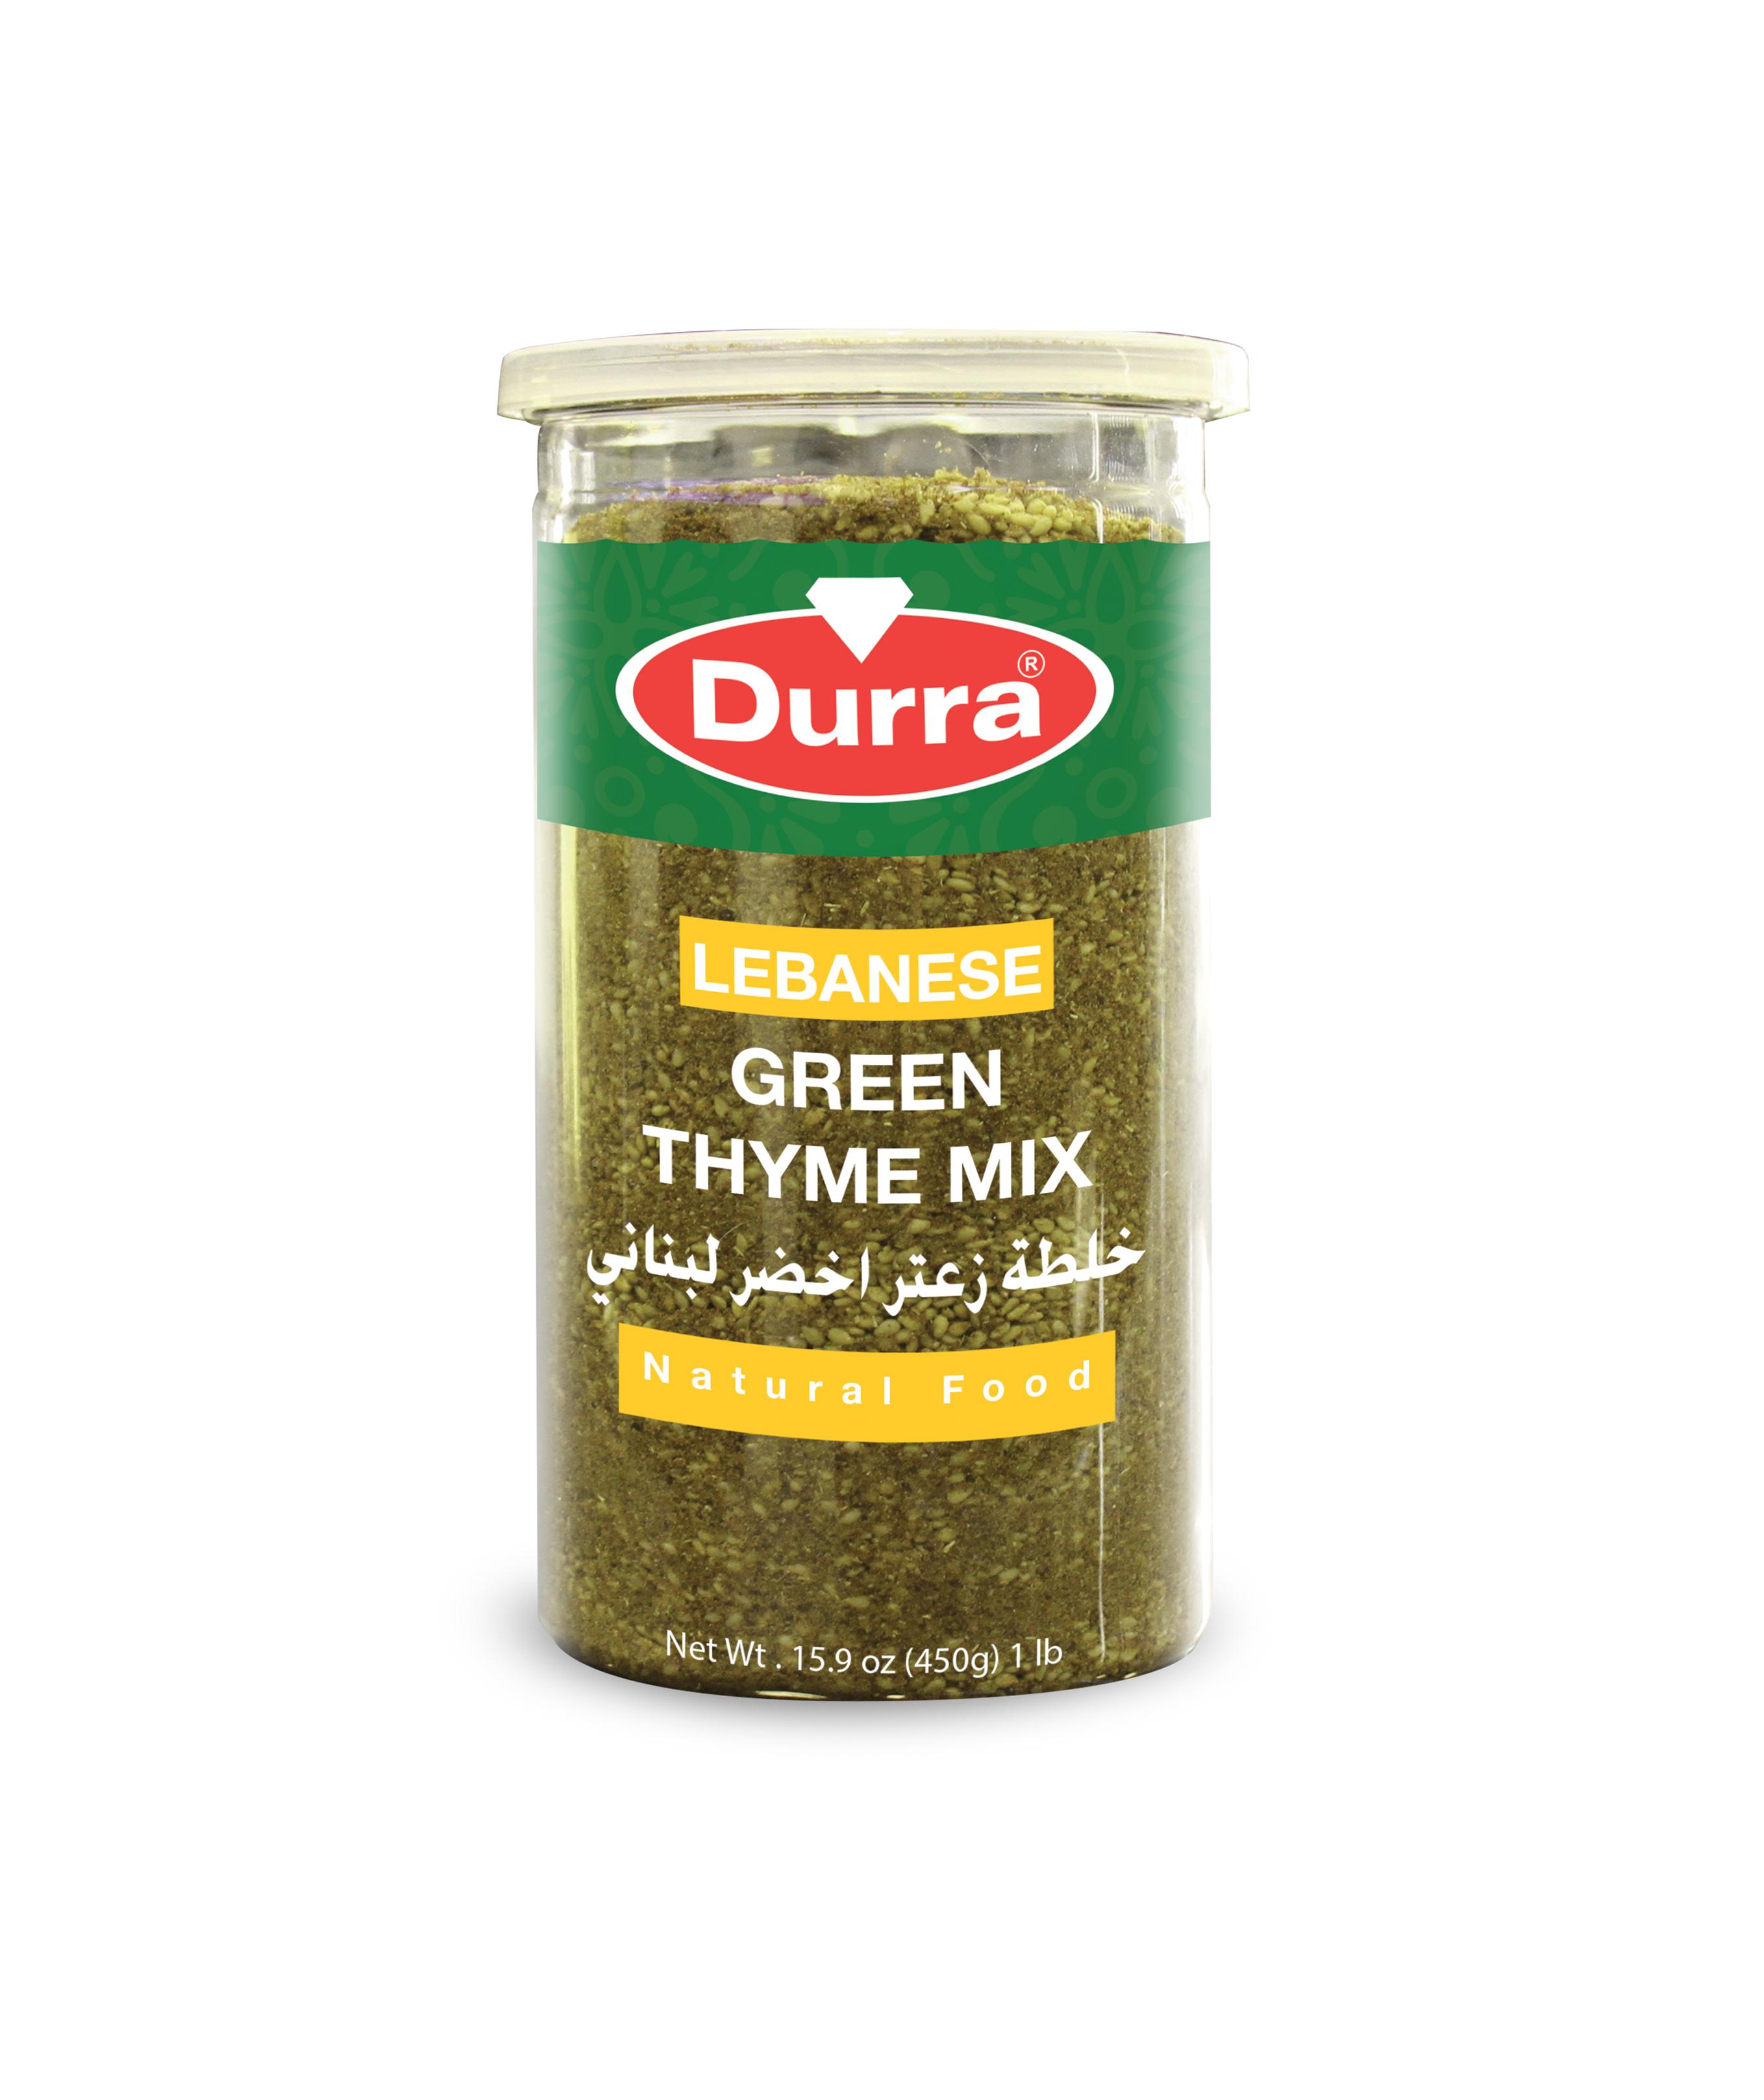 زعتر اخضر لبناني مطربان بلاستيك 450غ